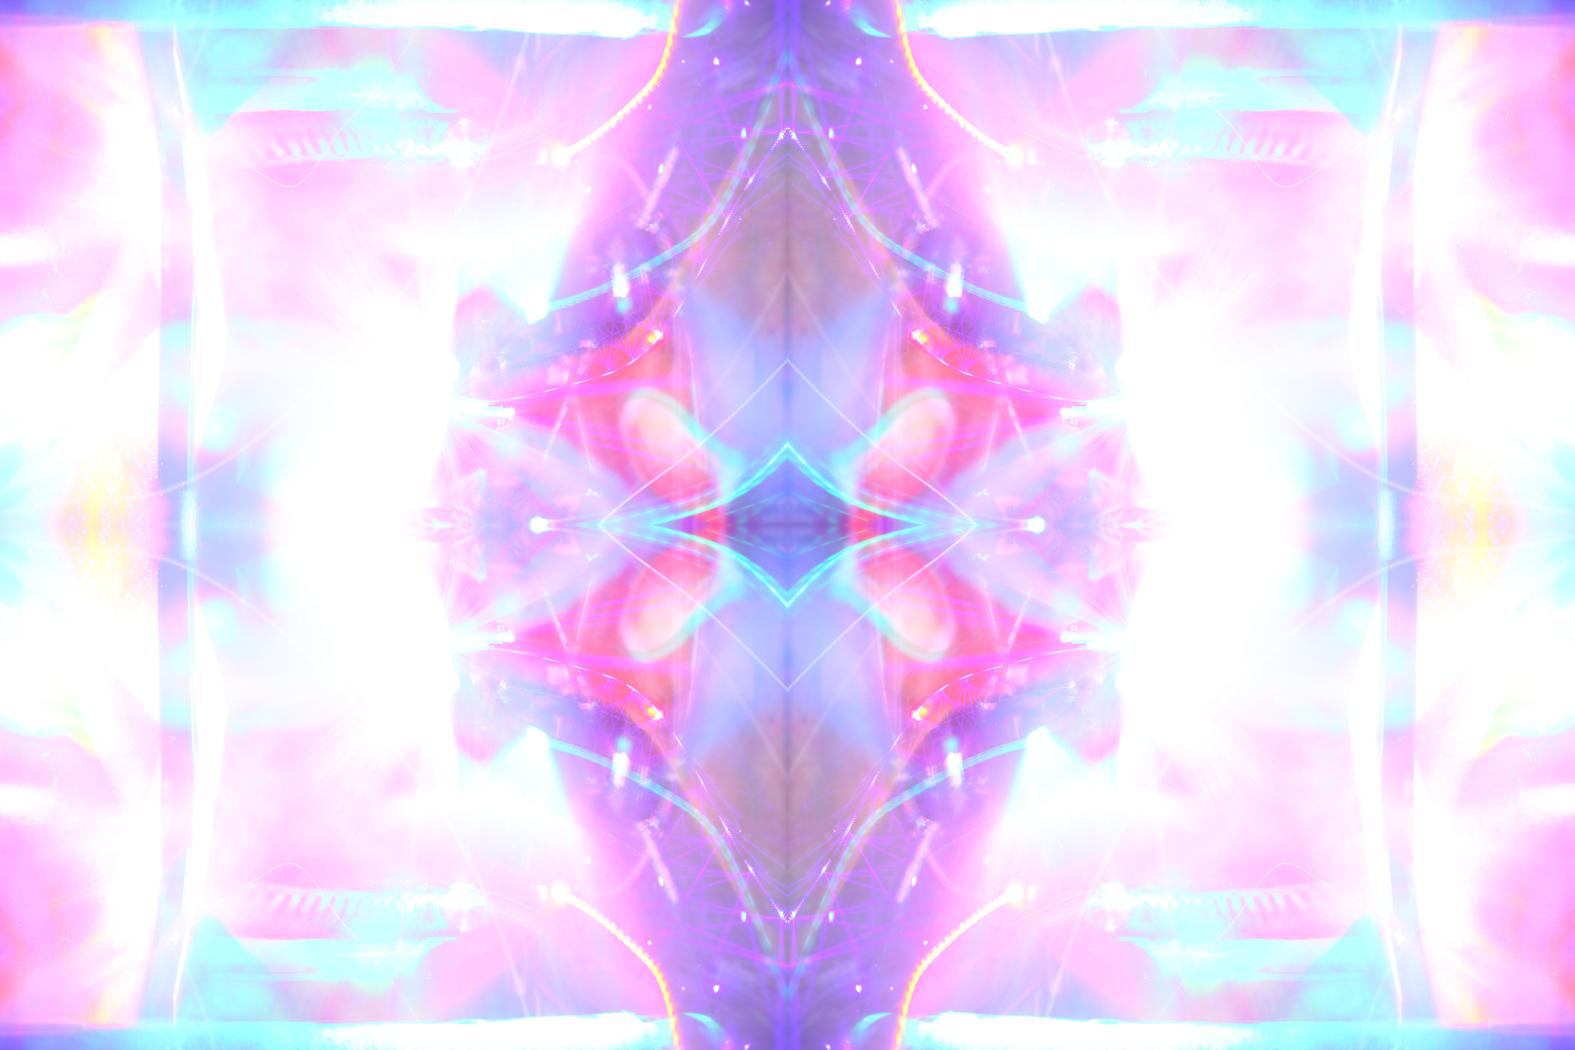 Matt Huppatz,  Hibiscus,  2015. Diasec mounted print. 56 x 85 cm. Courtesy of the artist.